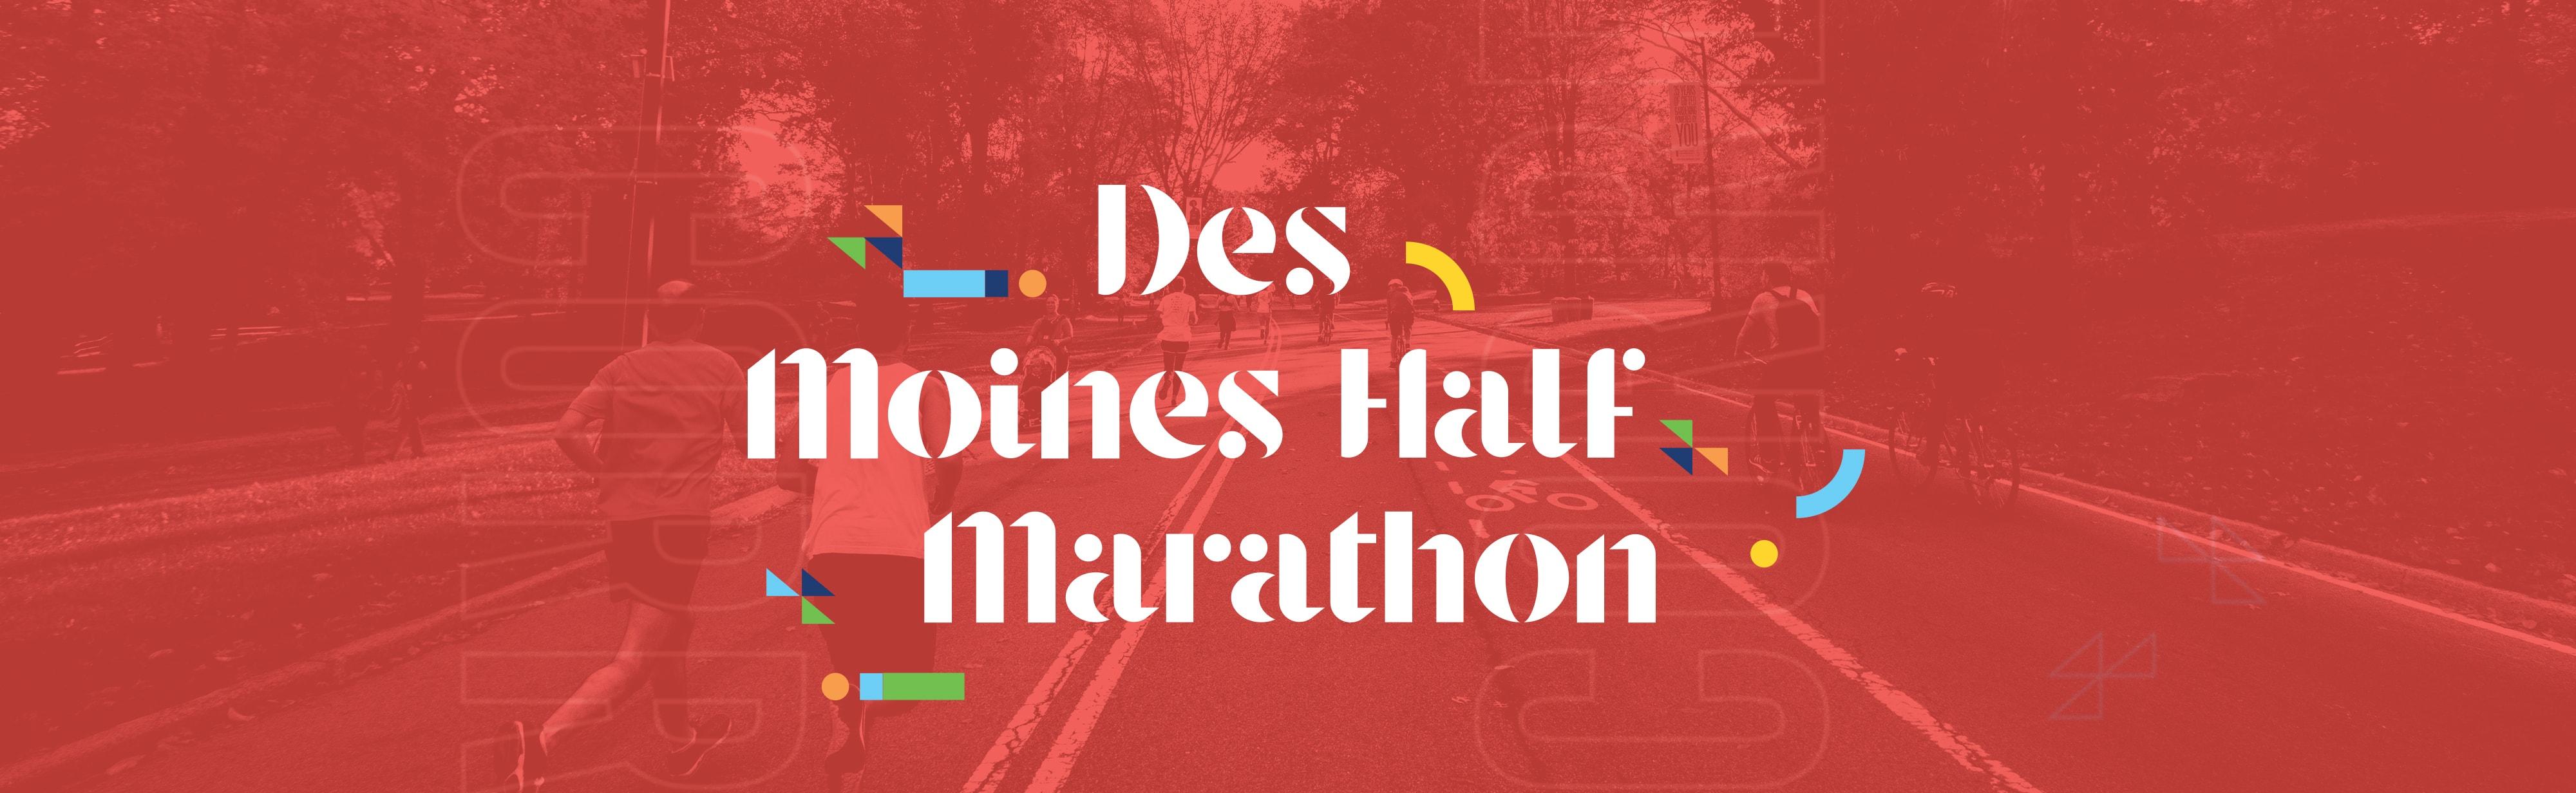 DesMoines Half Marathon